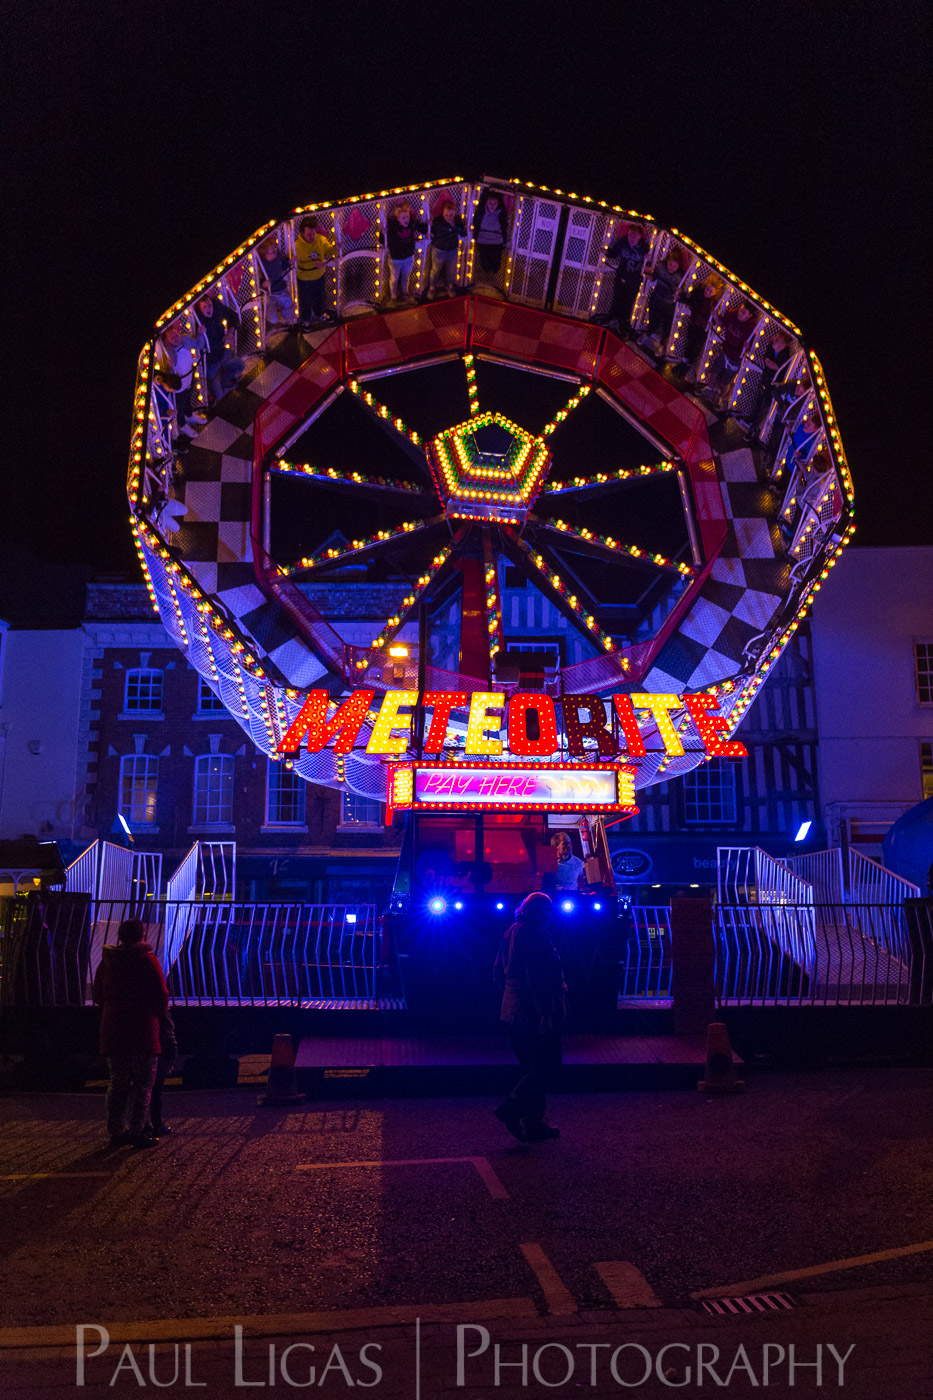 The Ledbury Fair, Herefordshire, people, street photographer photography event candid 2216